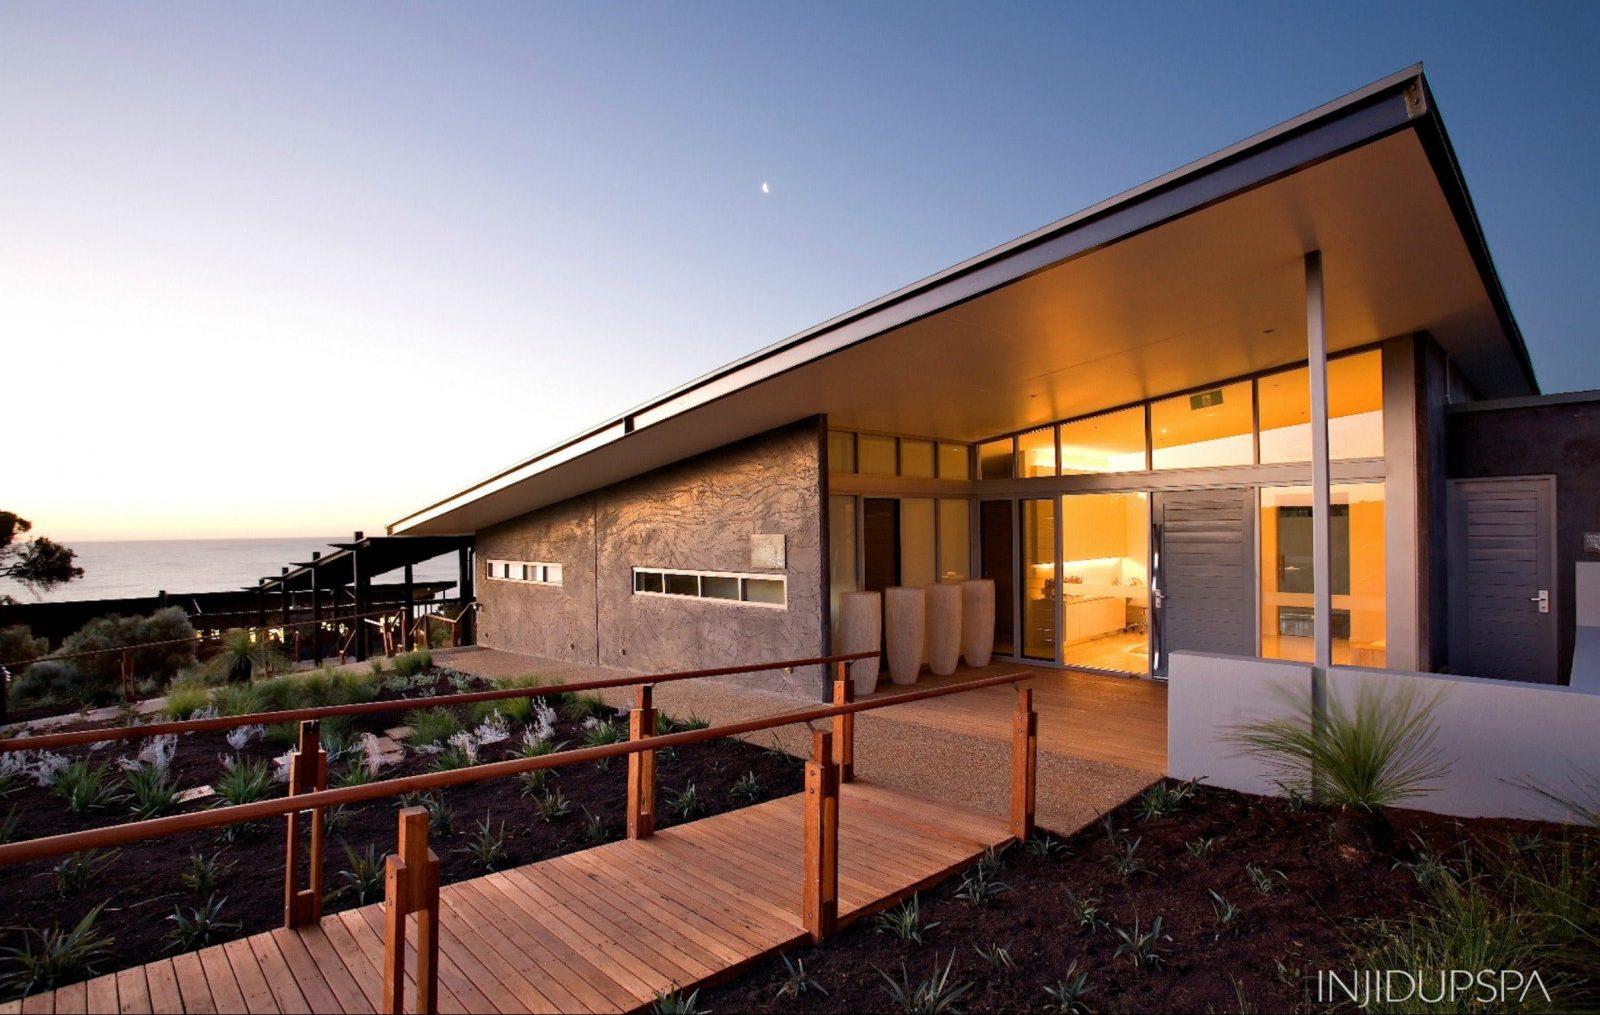 Injidup Spa Retreat, Yallingup, Western Australia